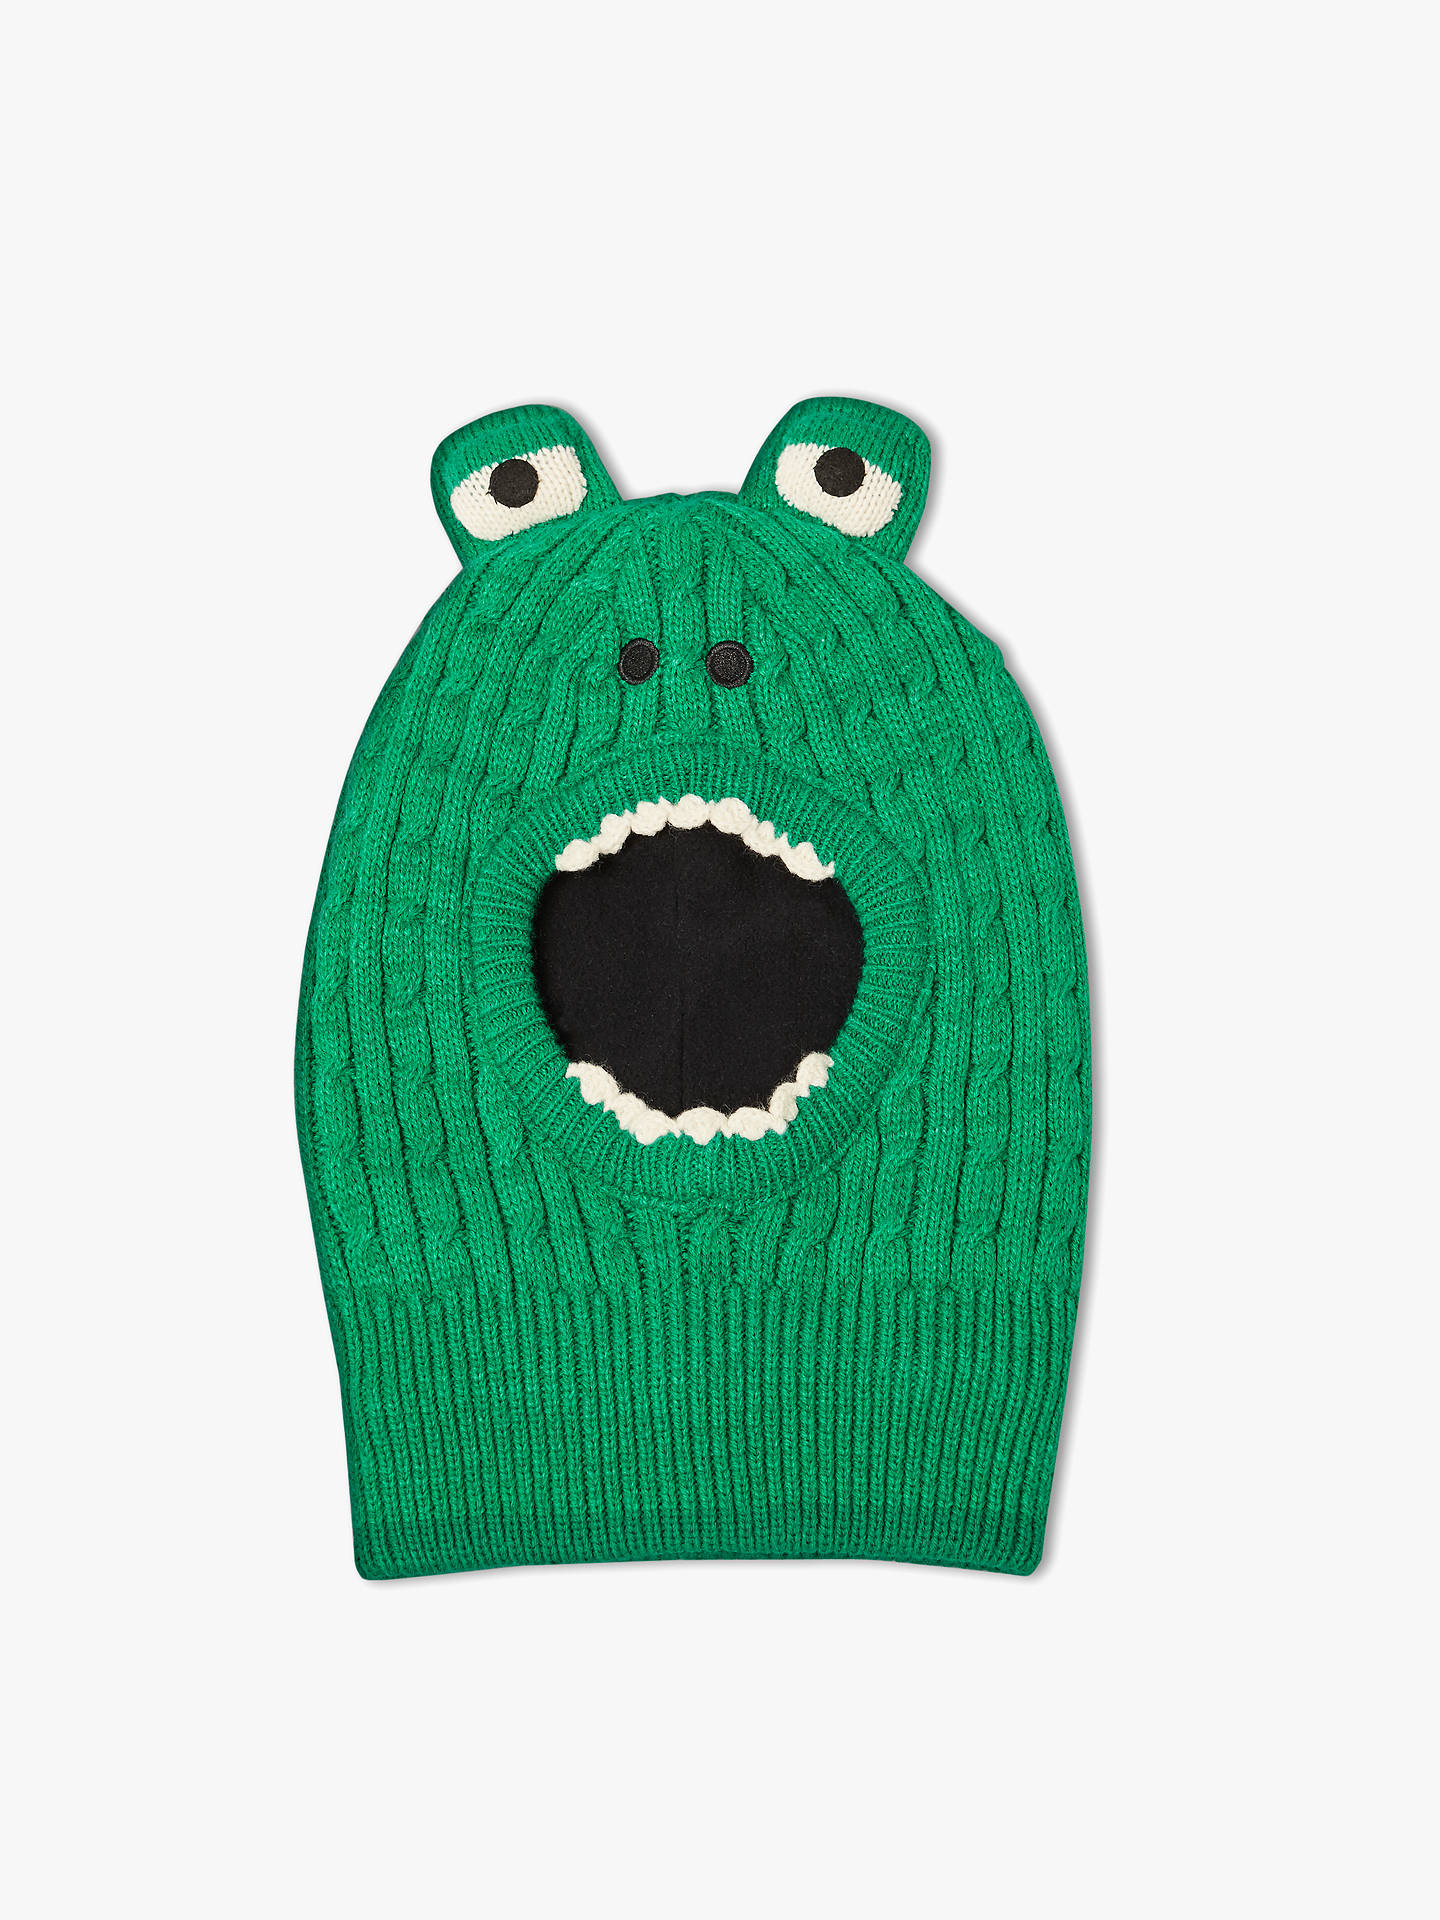 589d0ada3 John Lewis & Partners Children's Crocodile Balaclava Hat, Green at ...